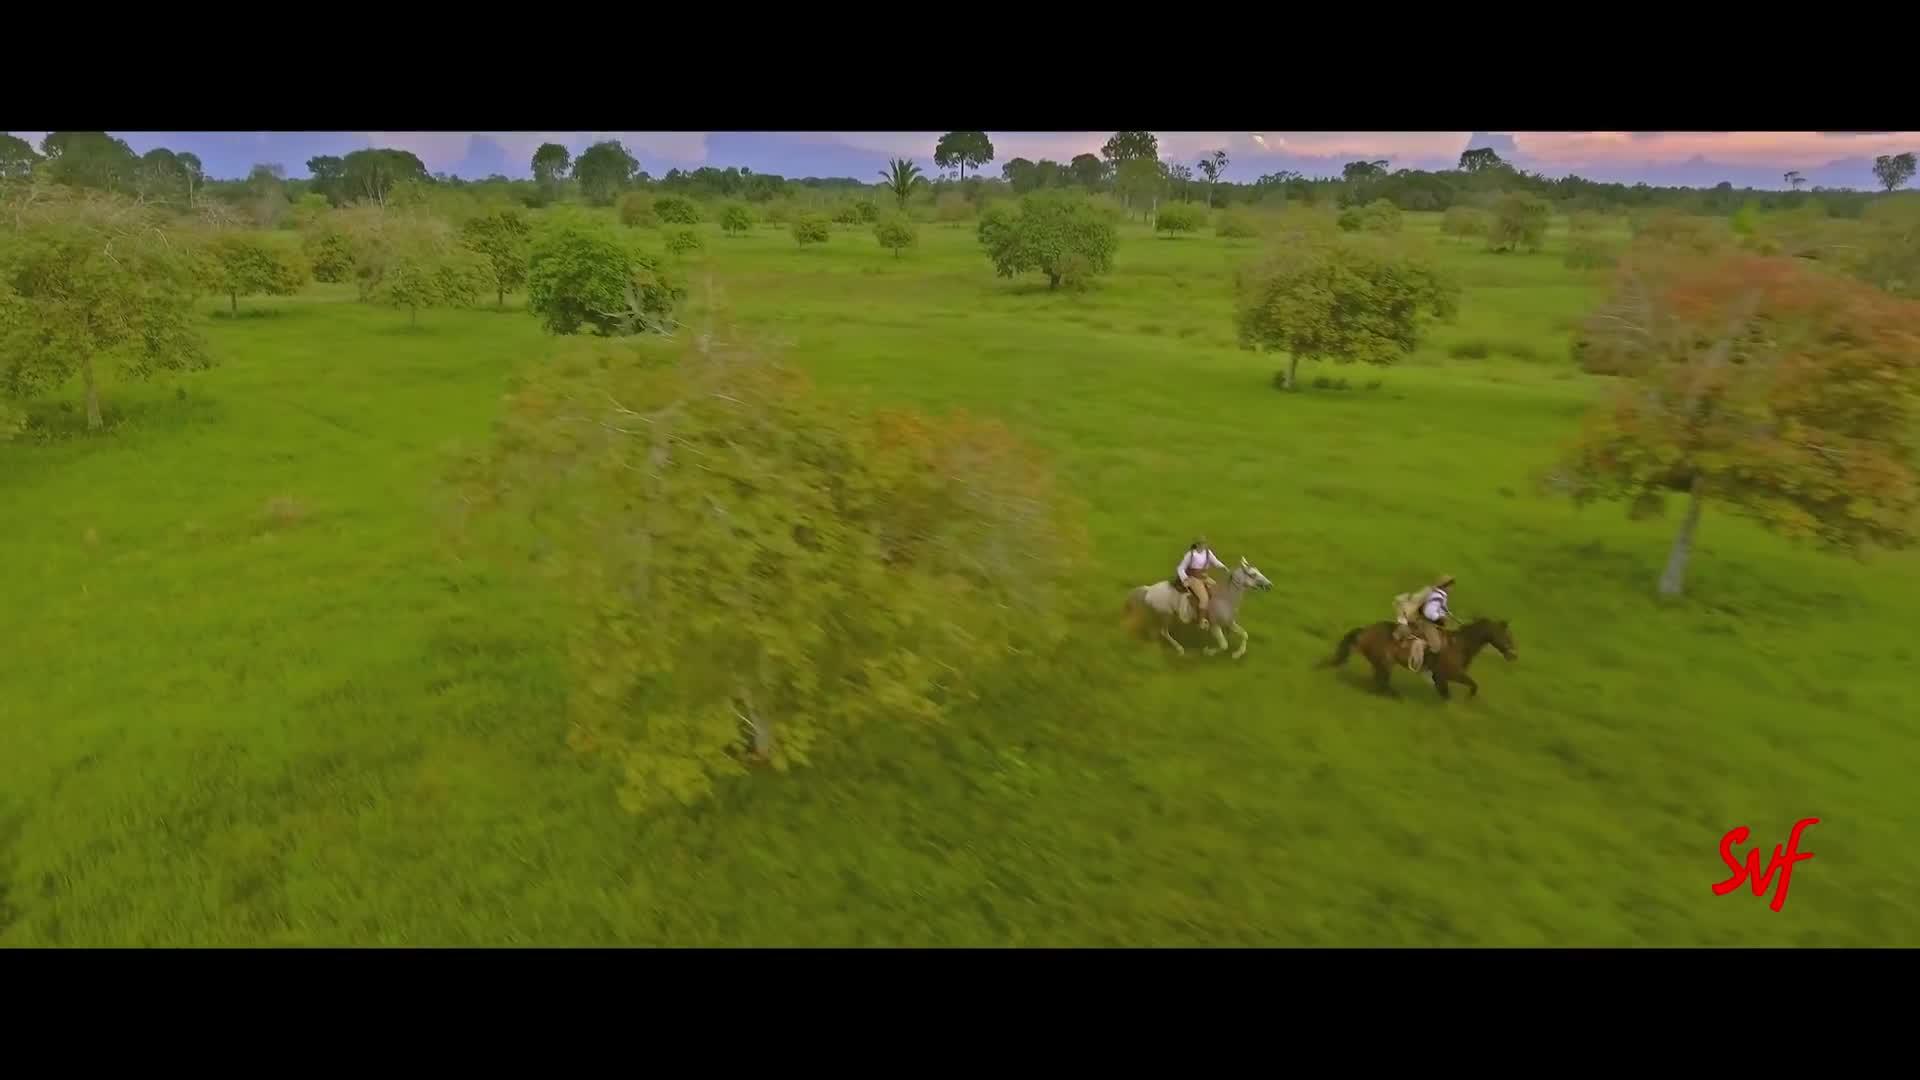 Amazon Obhijaan ( 2017) trailer